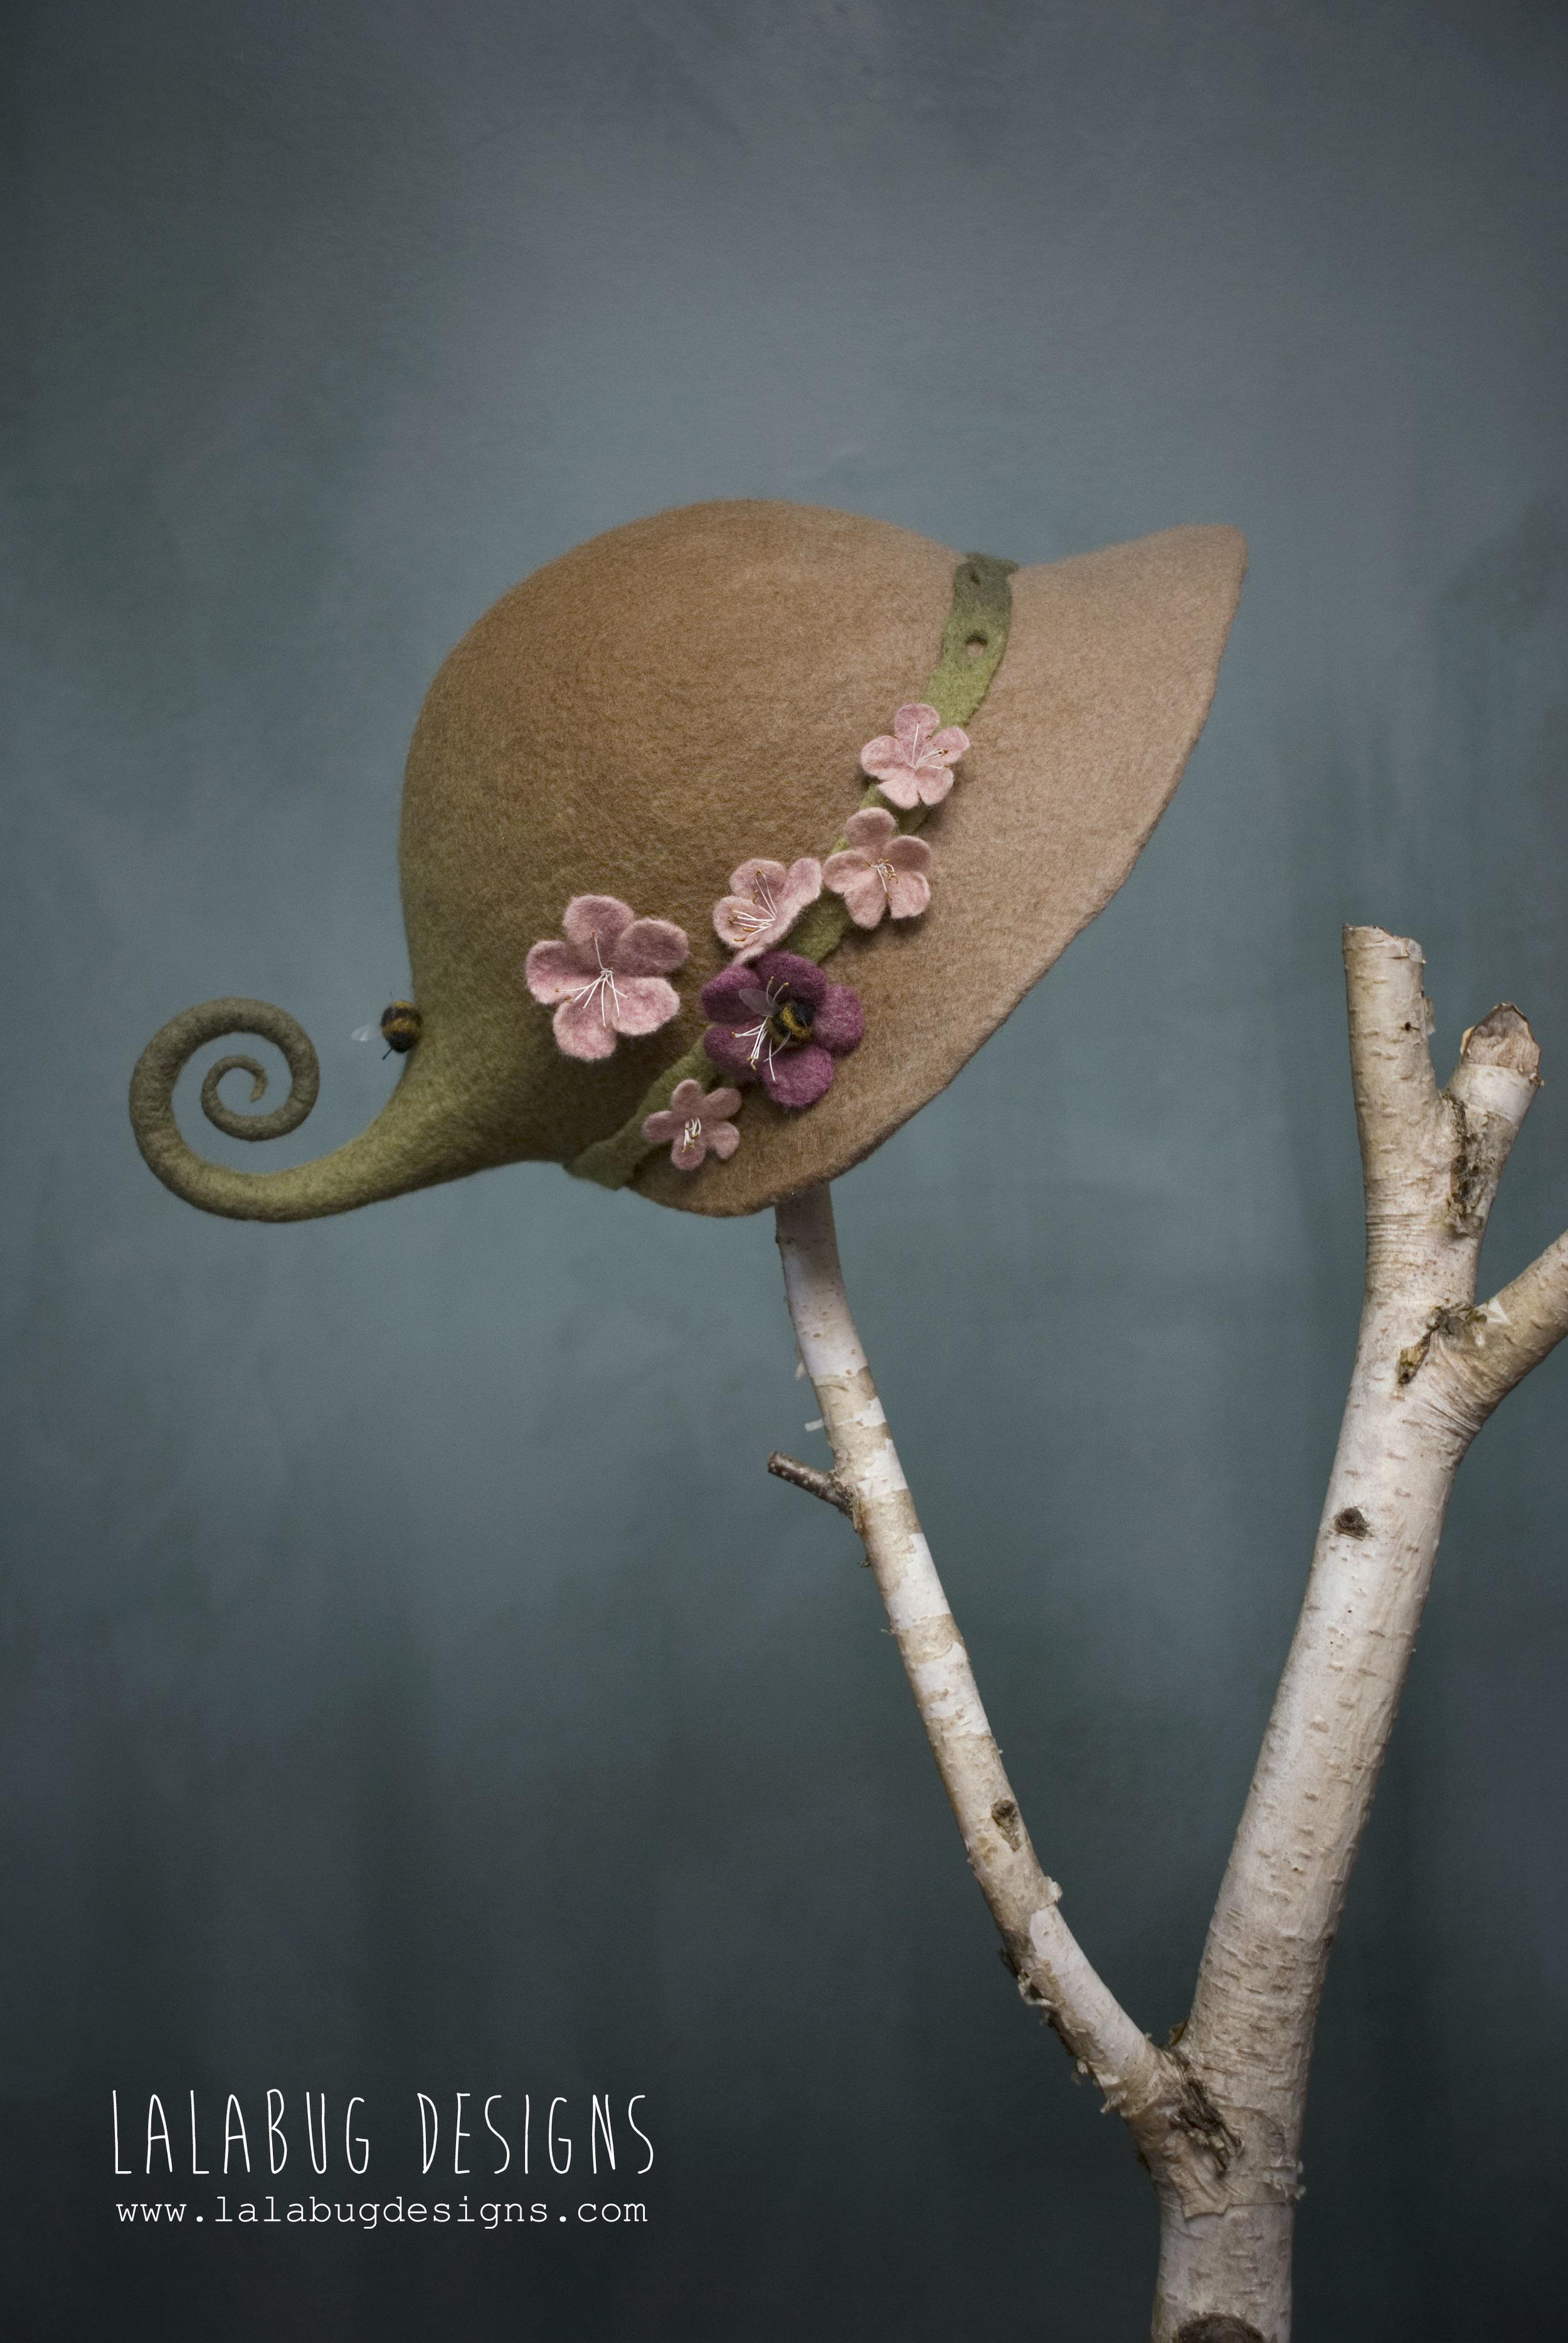 cloche-blossomdragon.jpg